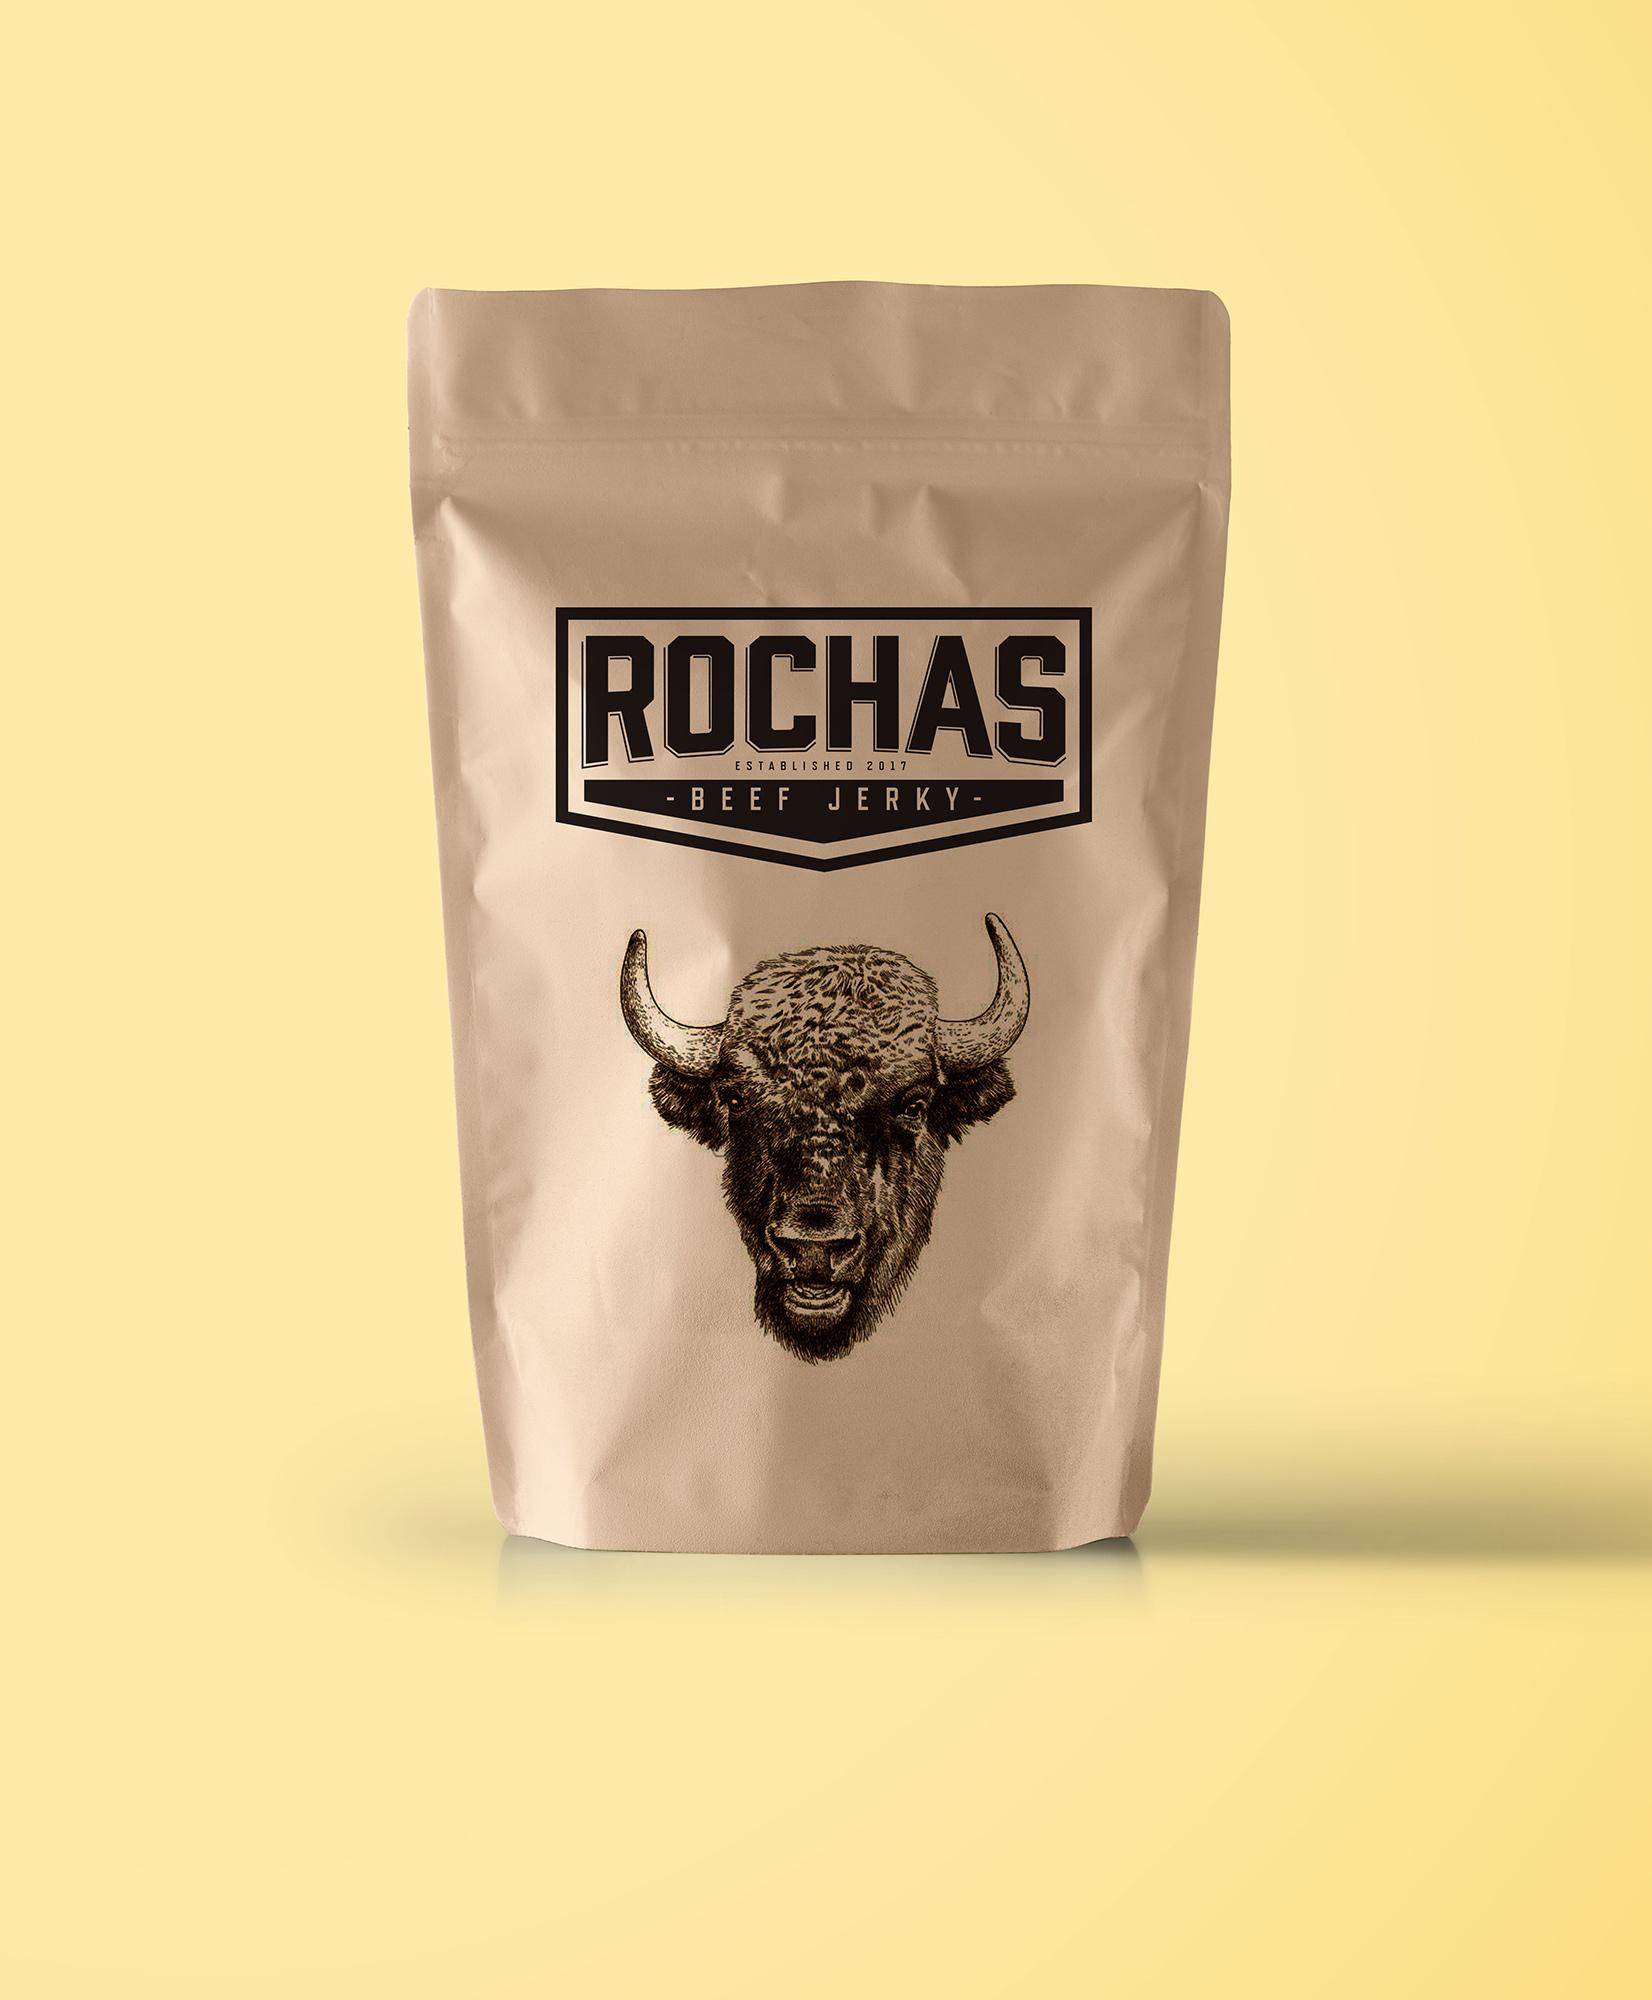 rochas-2.jpg